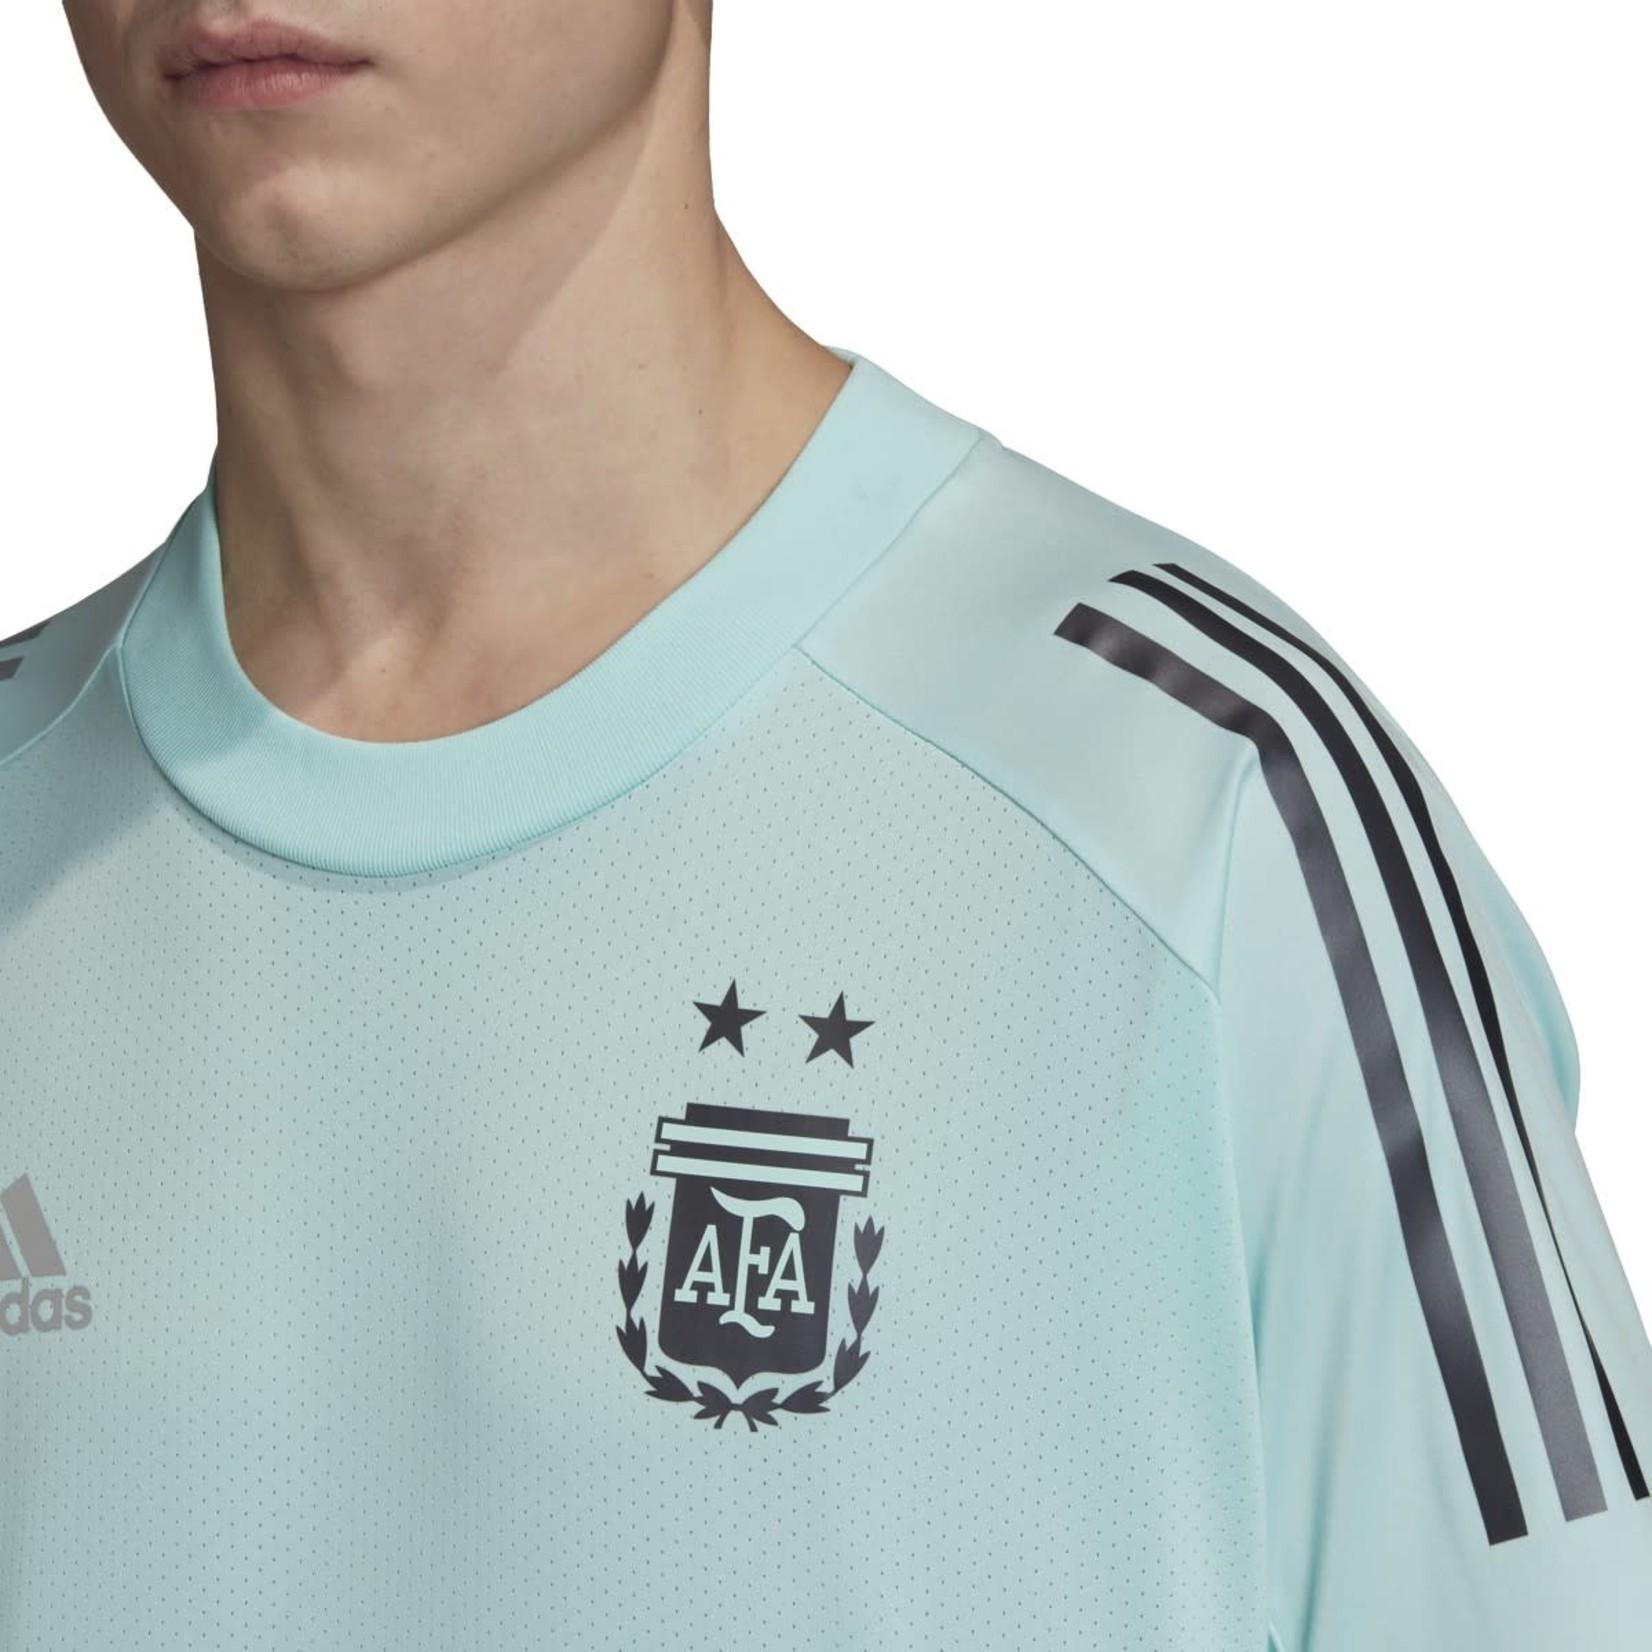 ADIDAS ARGENTINA 2020 TRAINING JERSEY